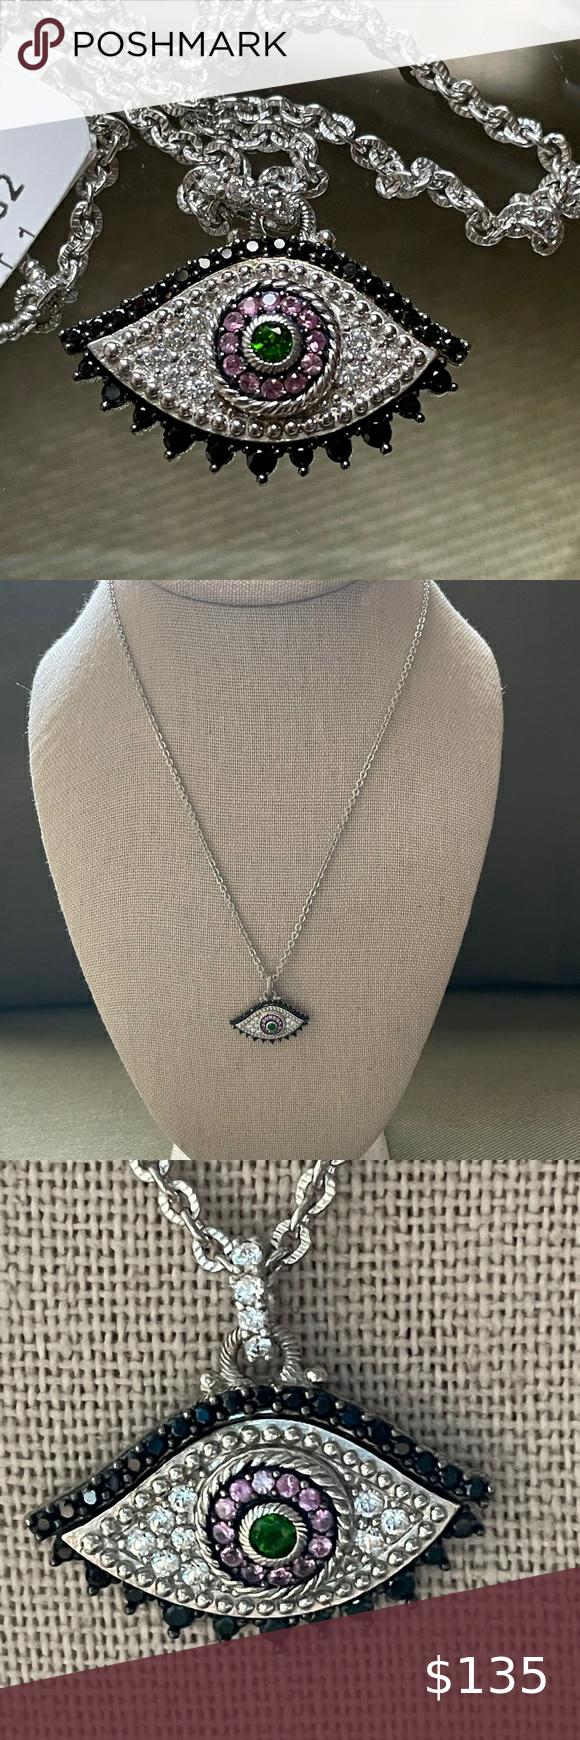 Sterling Silver Mandala Pendant with Chrome Diopside Gem